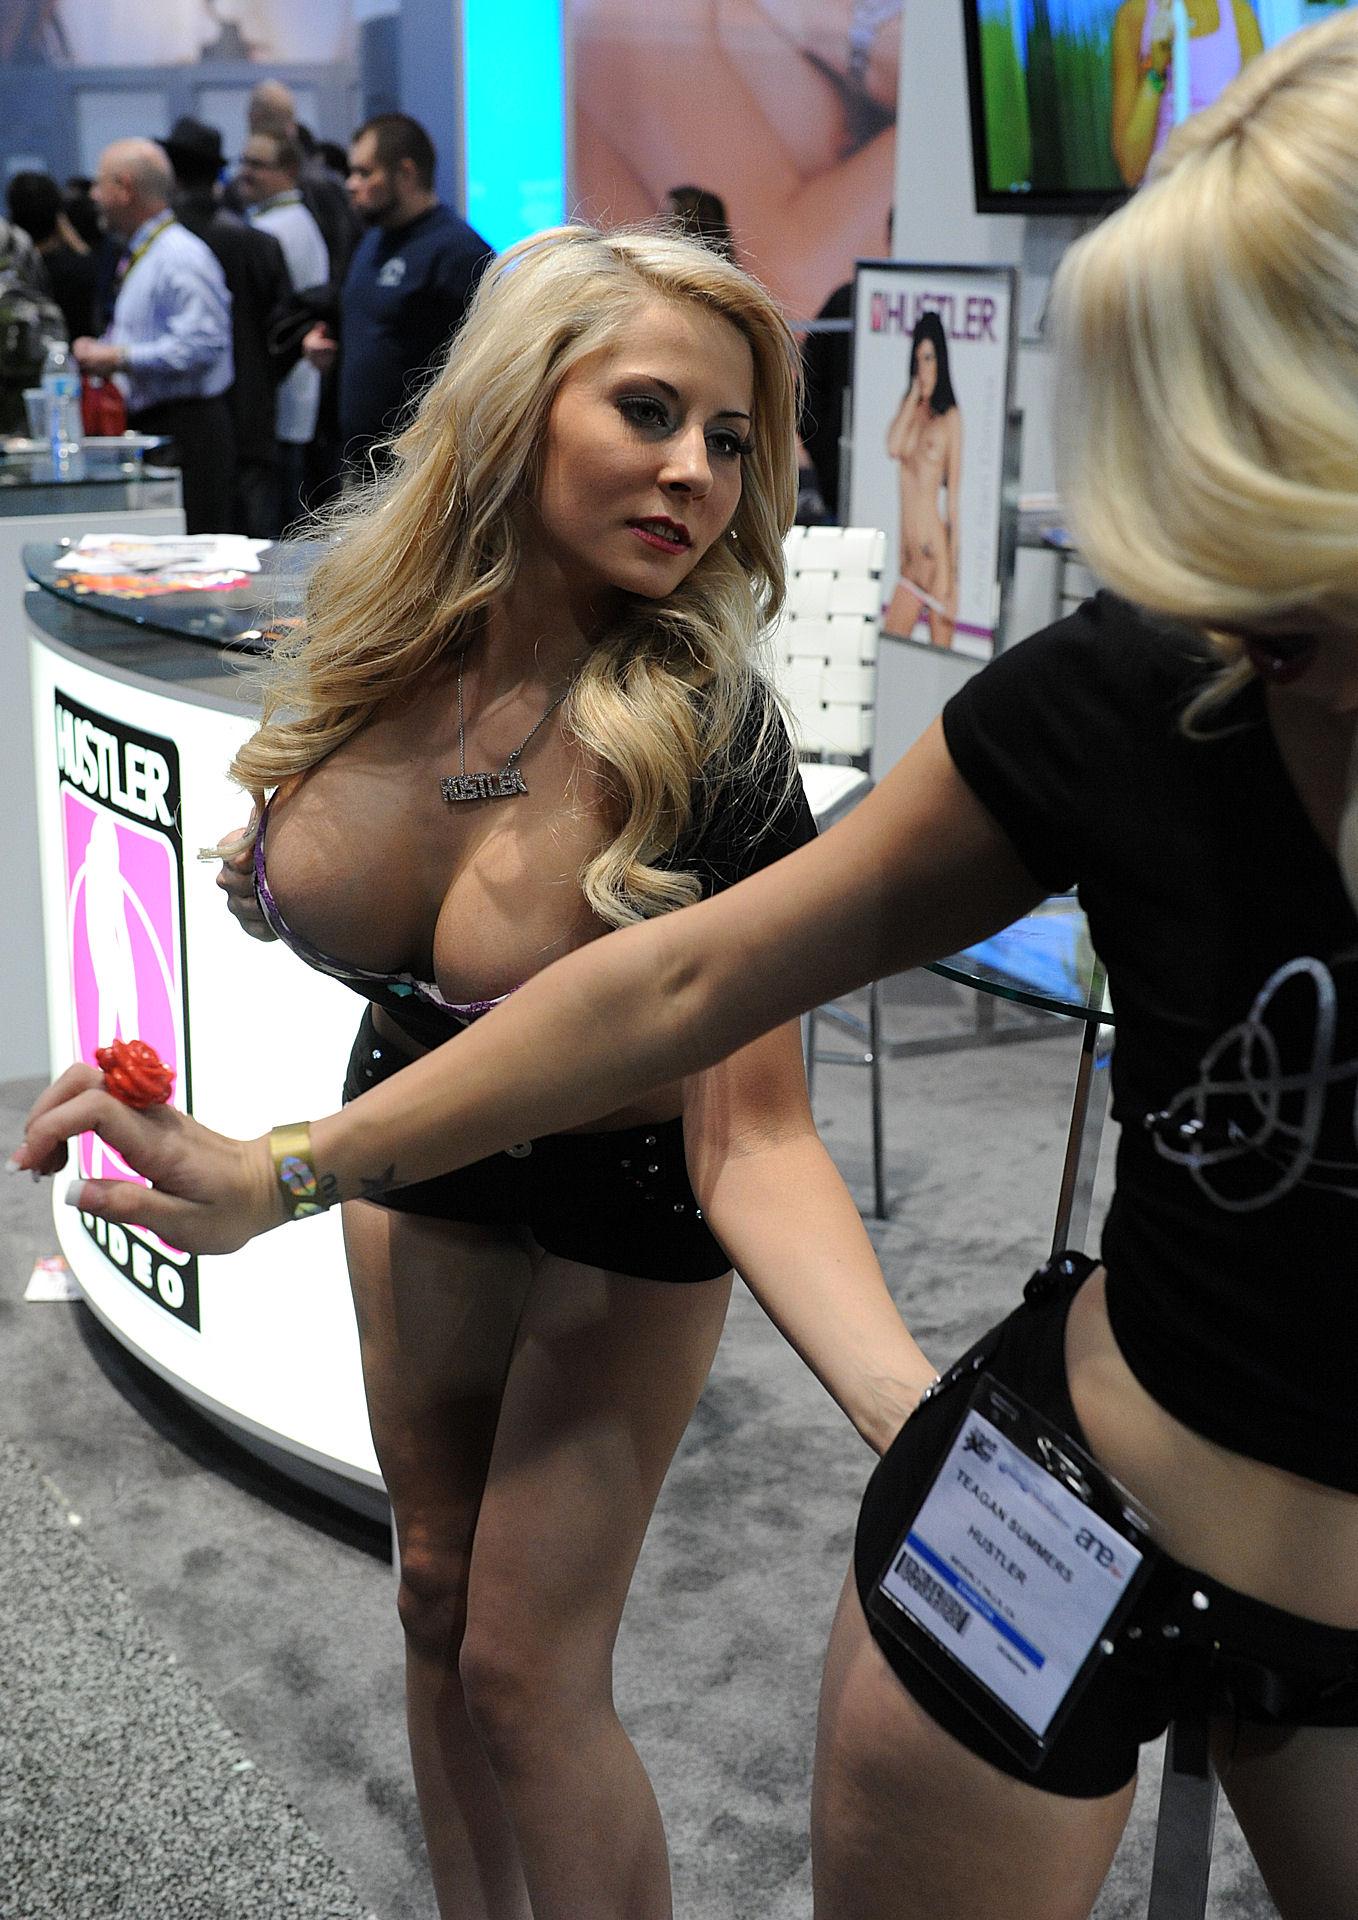 The excellent Adult pornstar convention